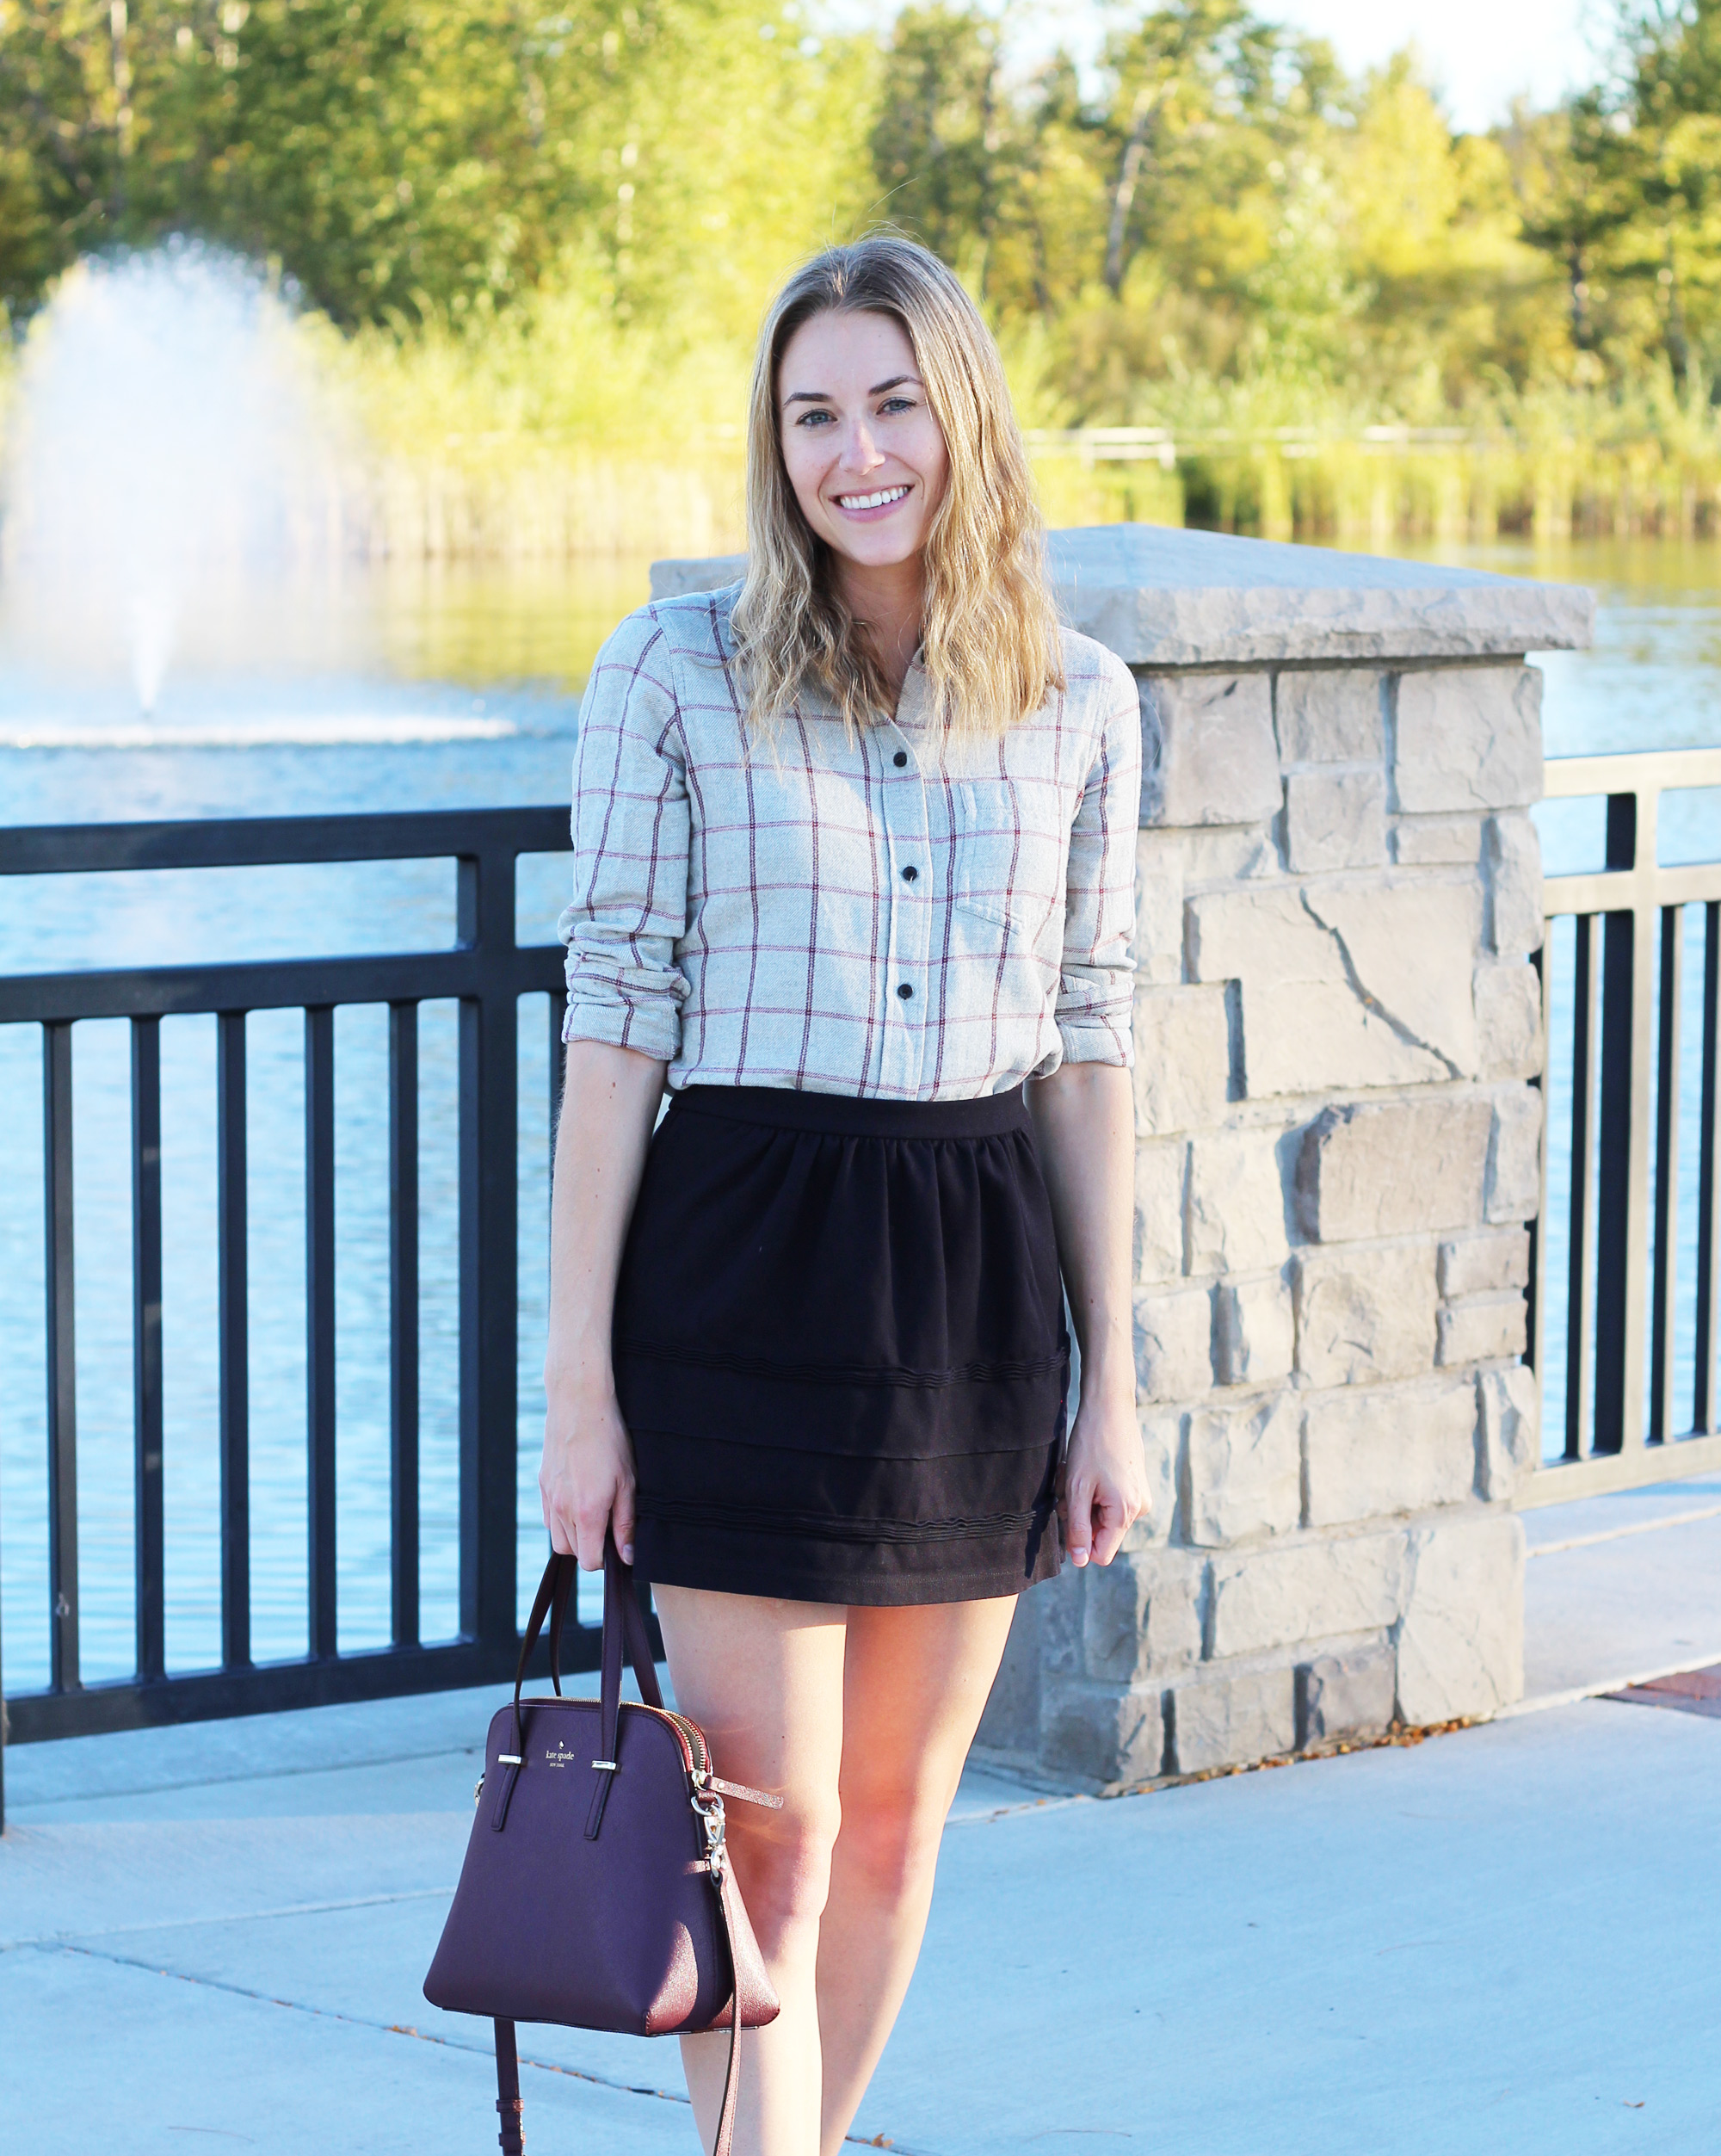 Kate Spade 'Cedar Street Maise' bag with grey windowpane flannel shirt and black mini skirt — Cotton Cashmere Cat Hair